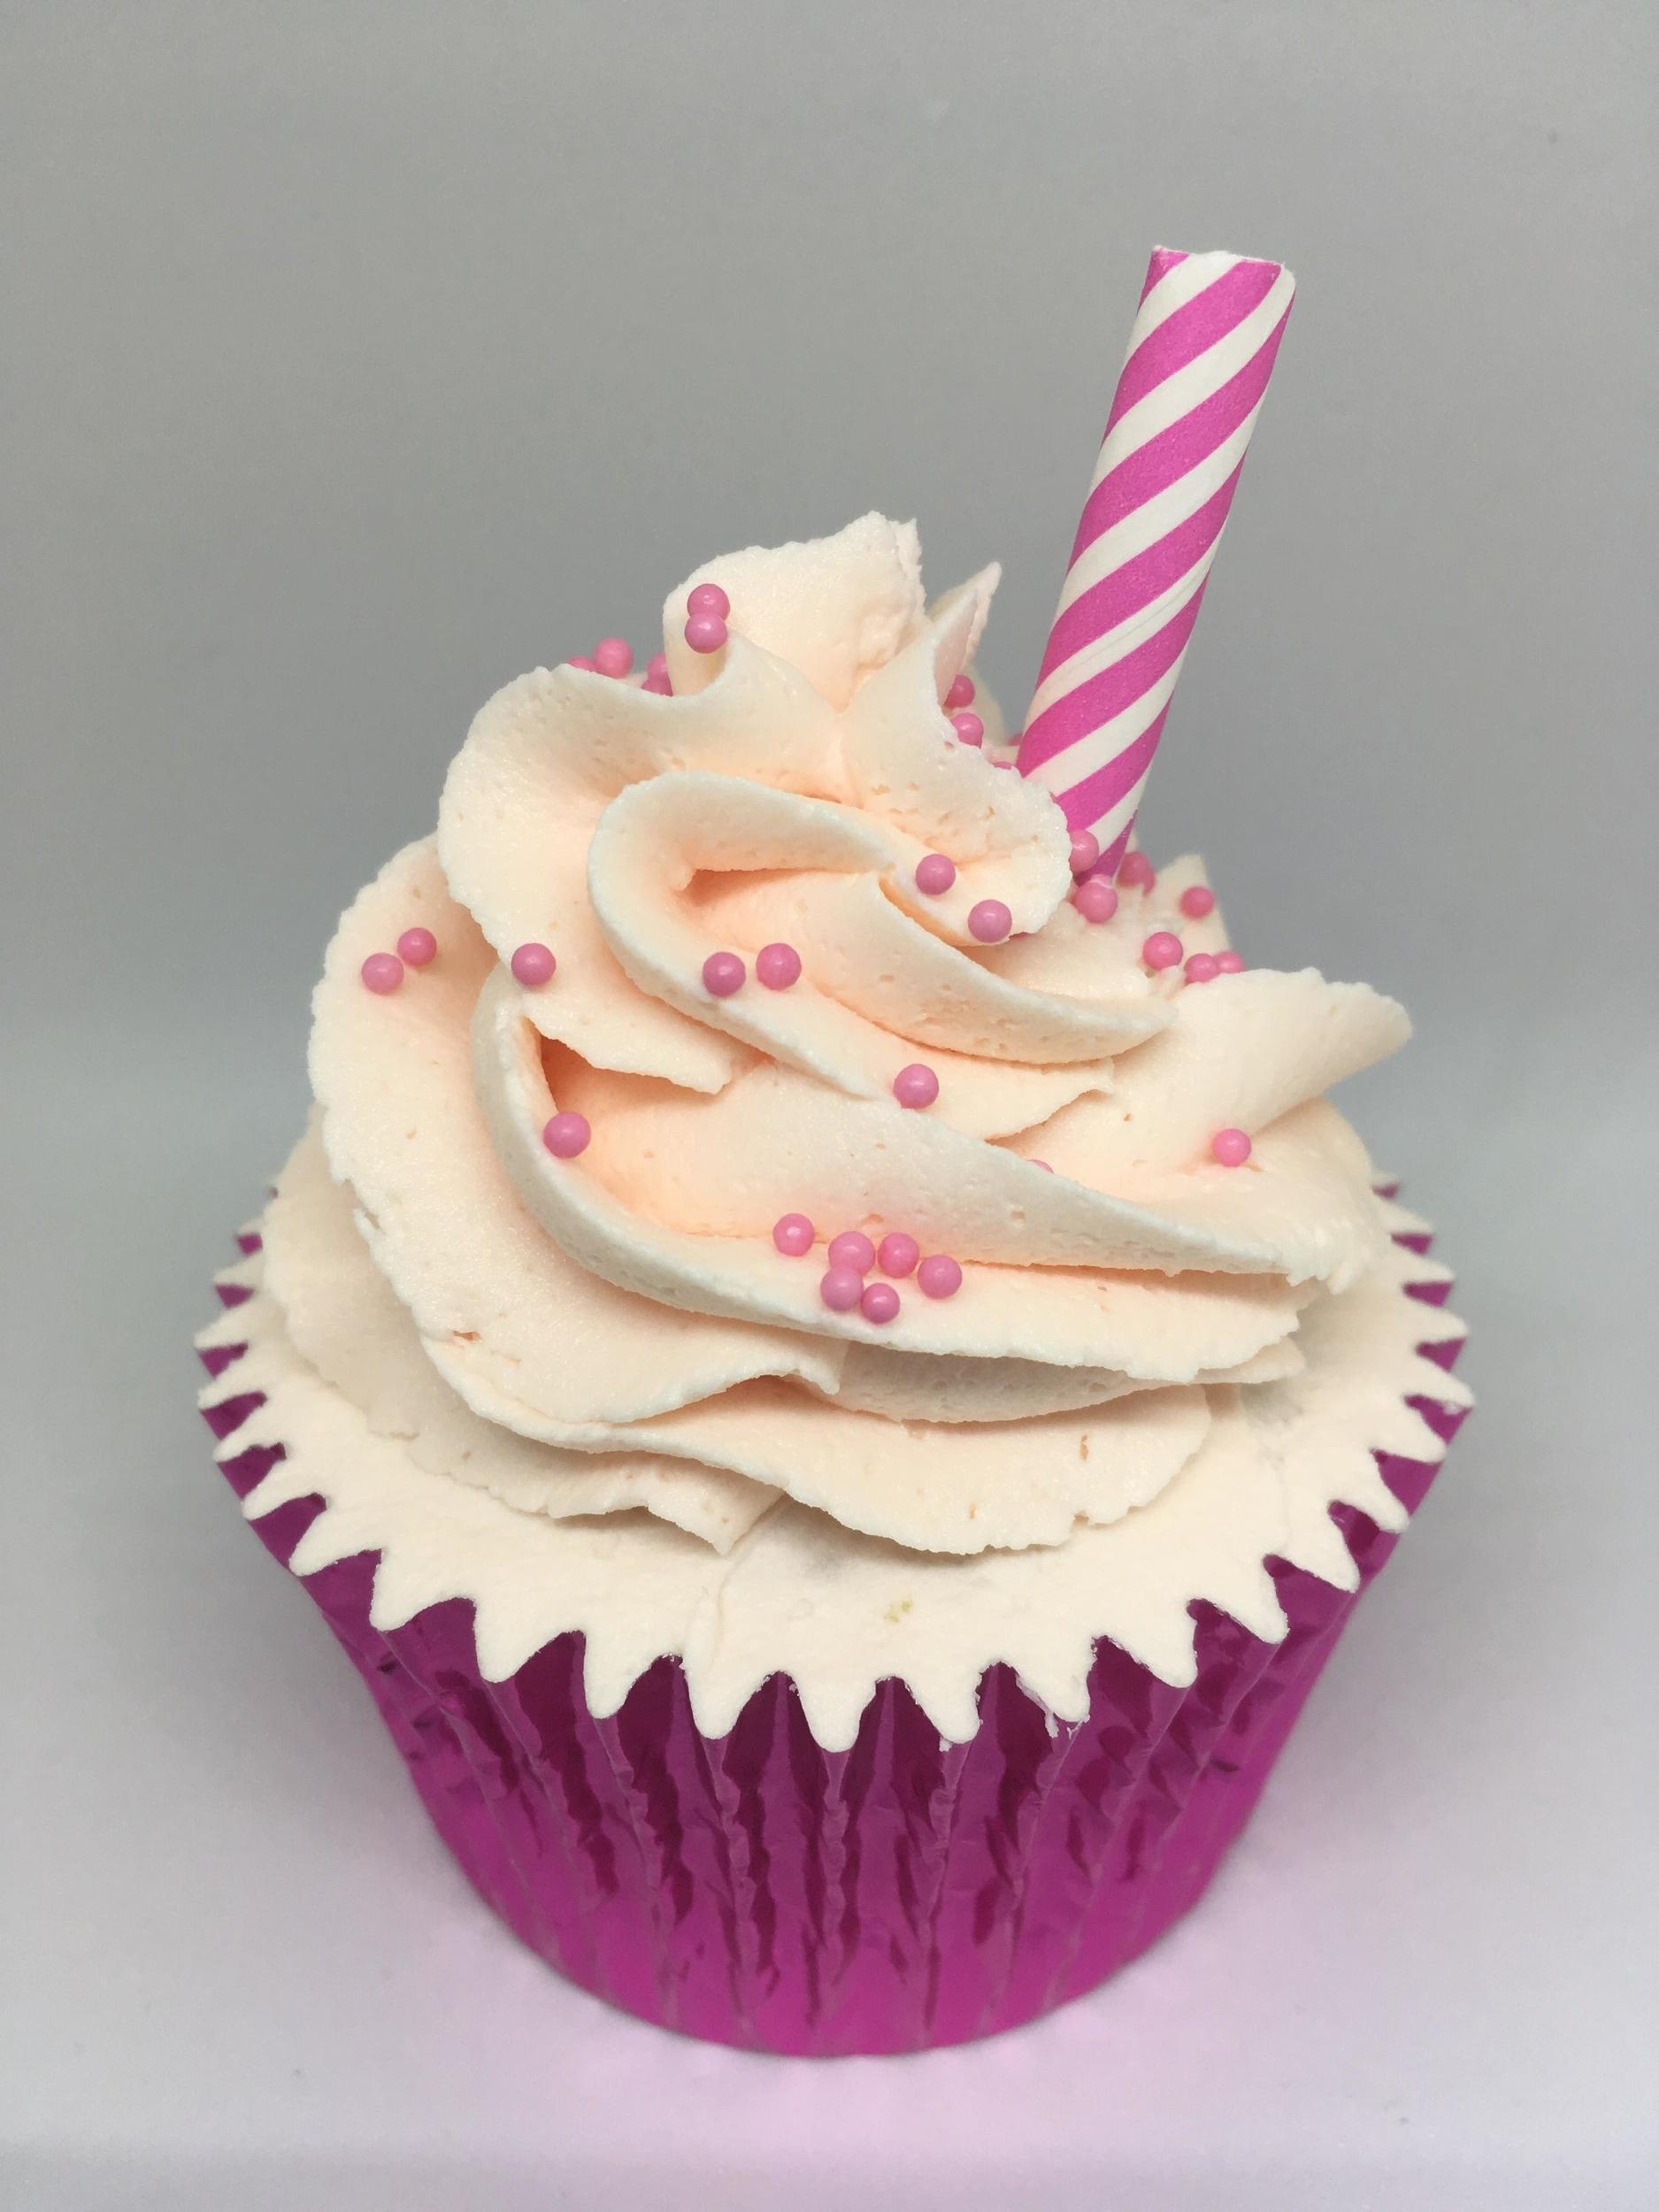 Strawberry Milkshake - A vanilla cupcake filled with strawberrry jam and topped with strawberry Milkshake flavoured buttercream